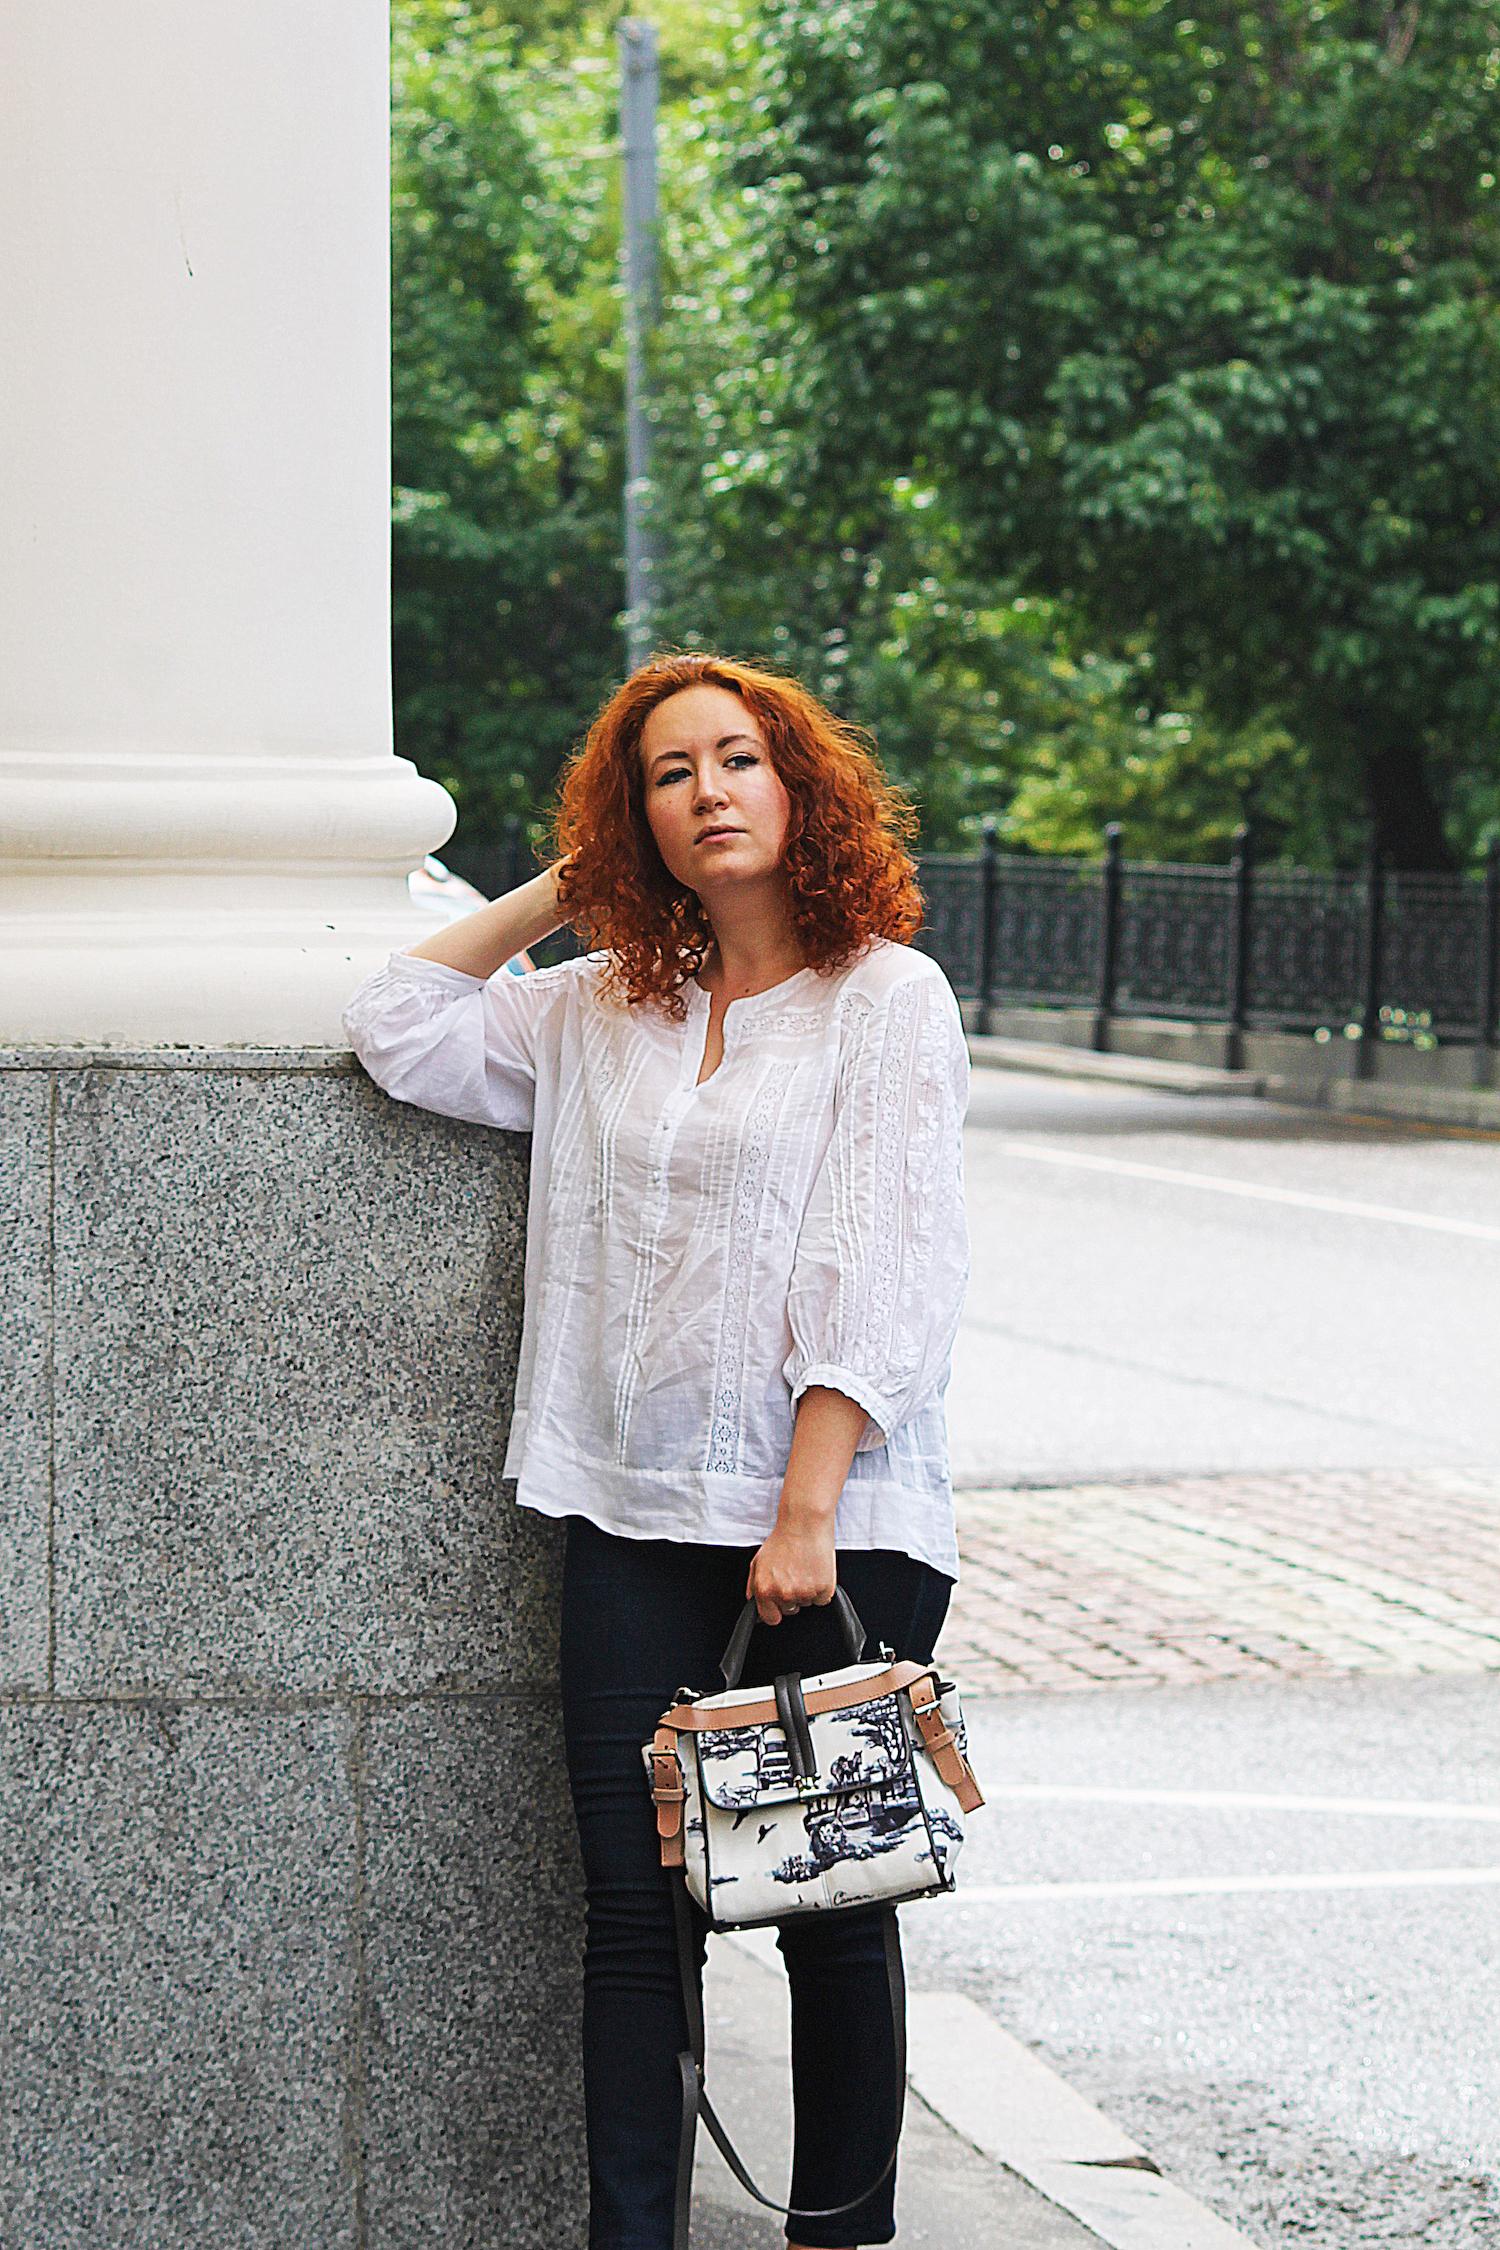 enn franco says fashion blog fashion illustration marni sandals massimo dutti jeans outfit